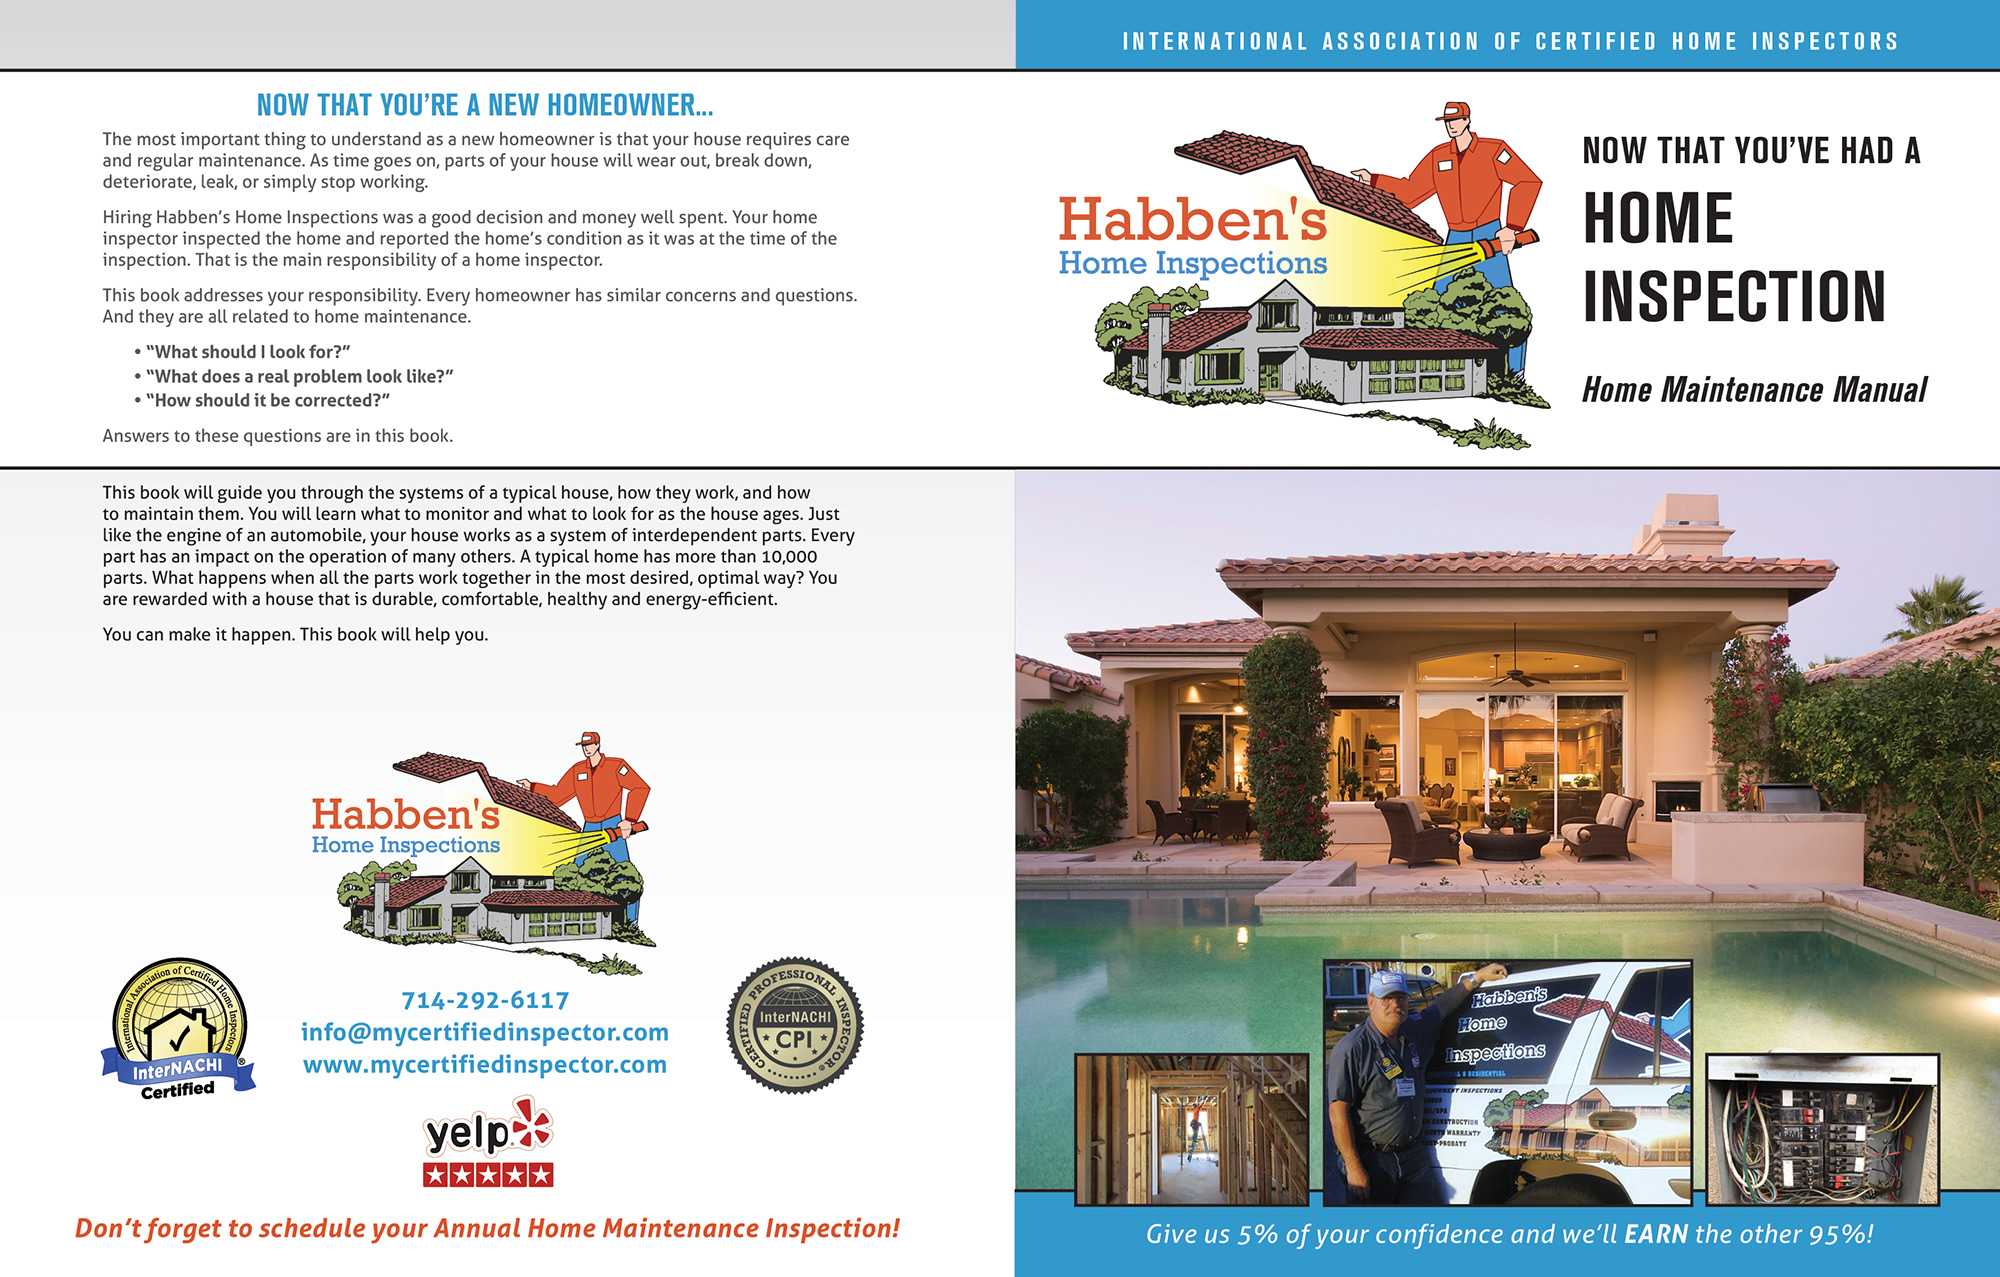 Custom Home Maintenance Book for Habben's Home Inspections.